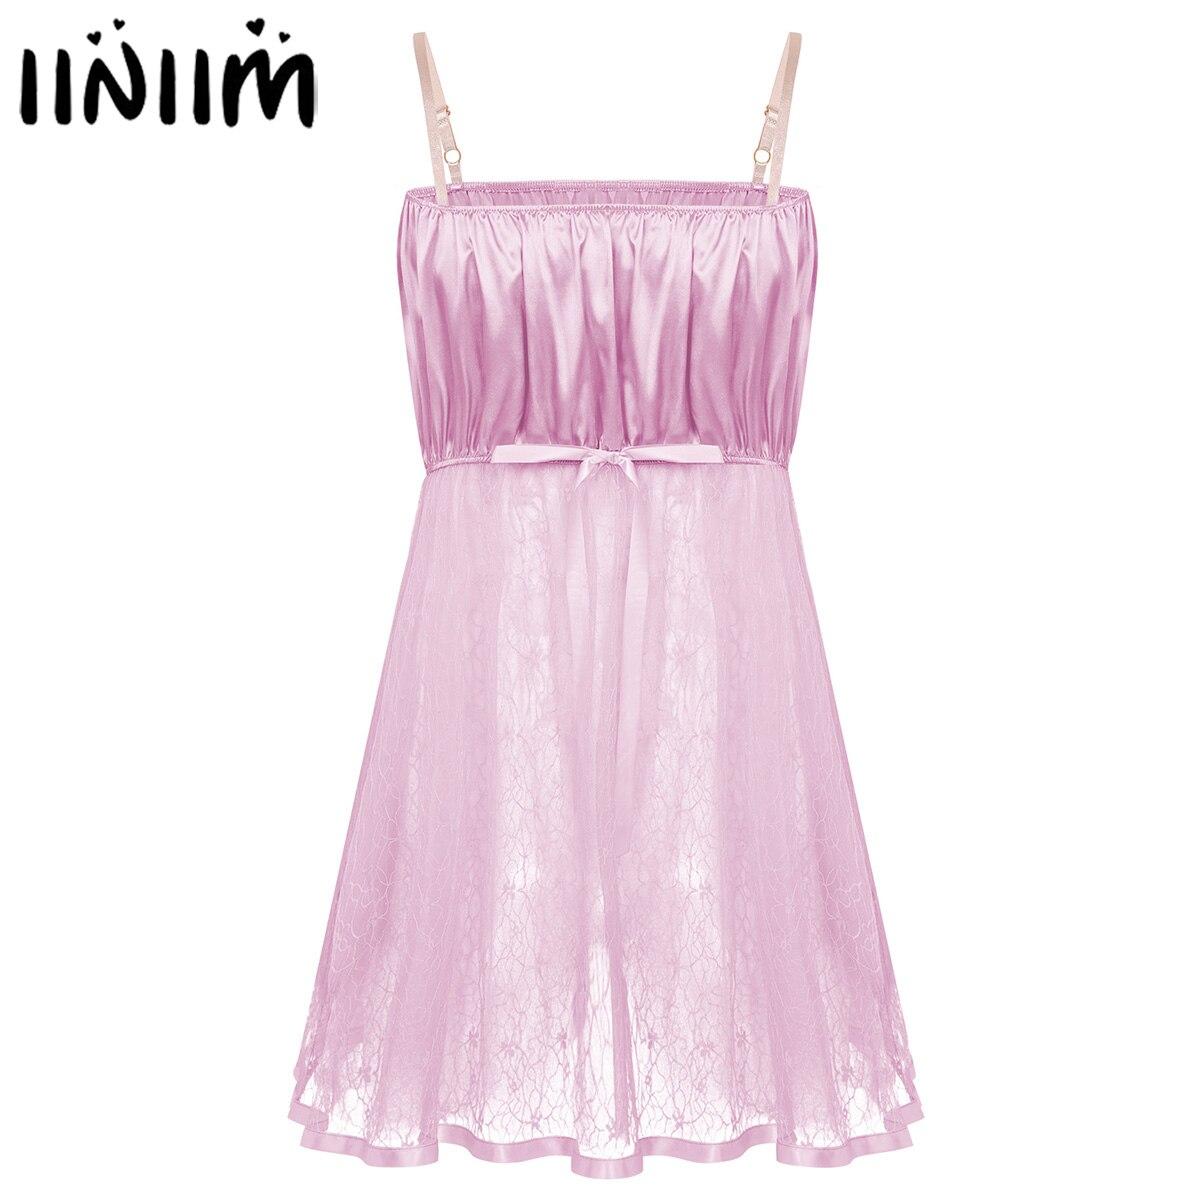 Men Lace Sissy Crossdress Baby Doll Pajamas Dress Ruffled Tulle Robe Nightwear